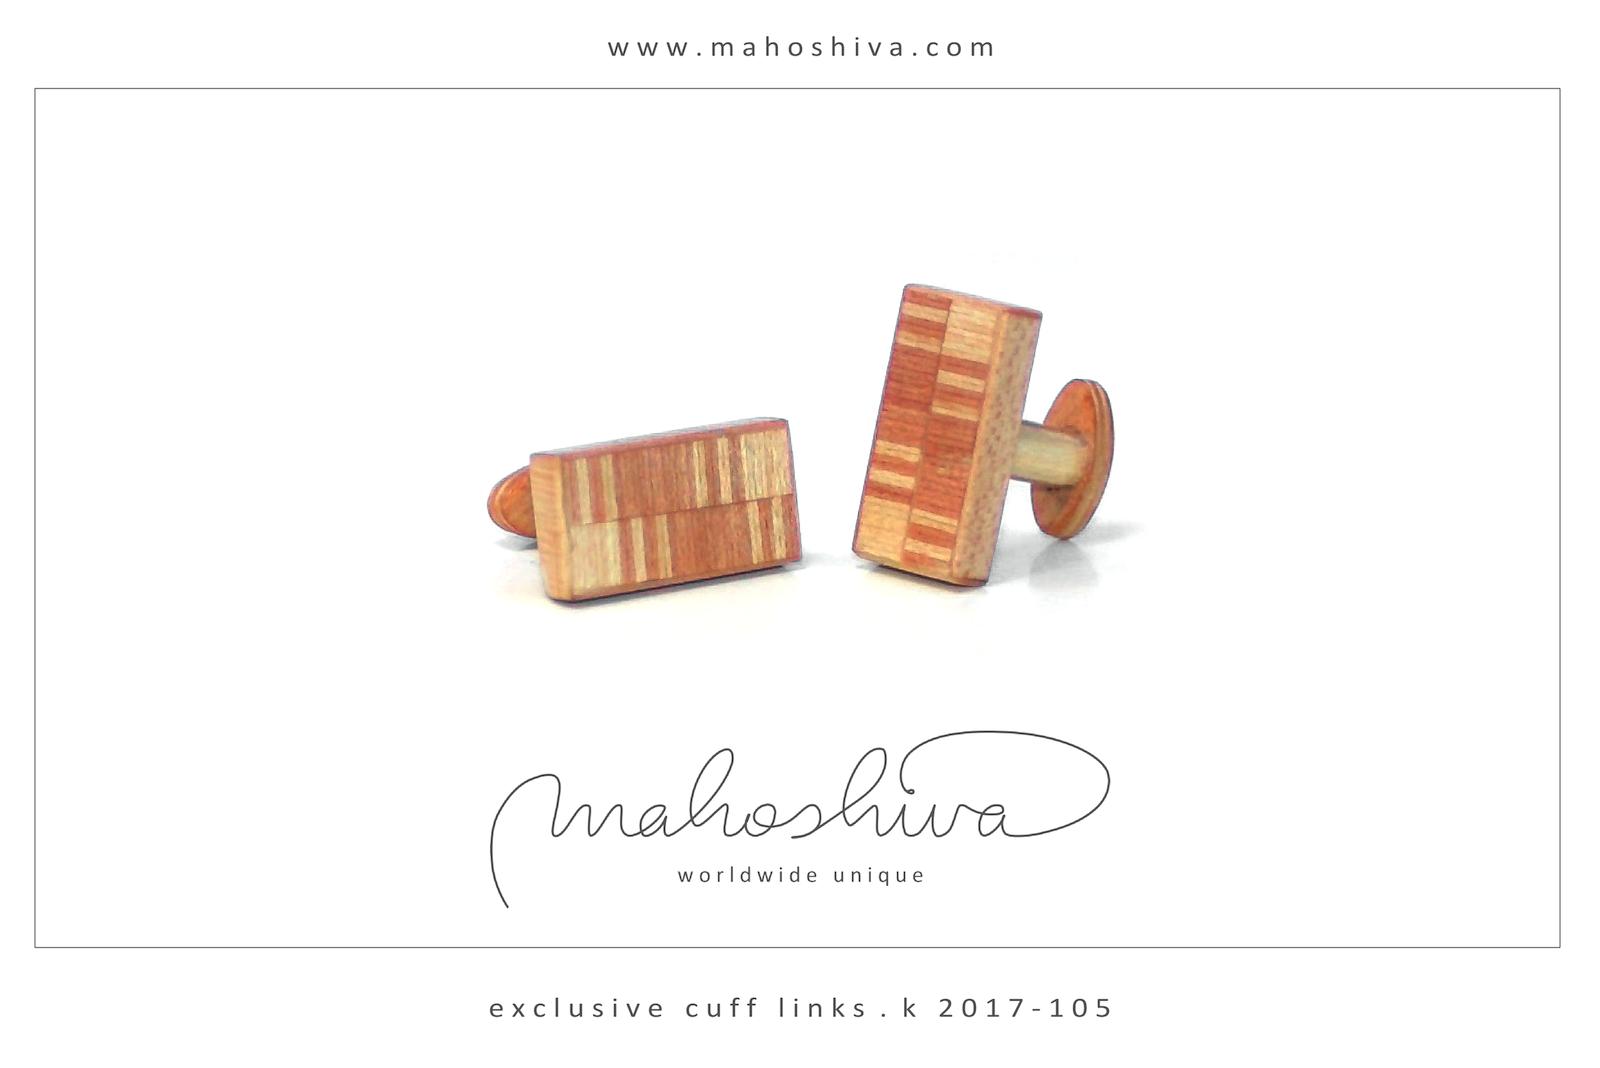 mahoshiva k 2017-105 Manschettenknöpfe aus Holz